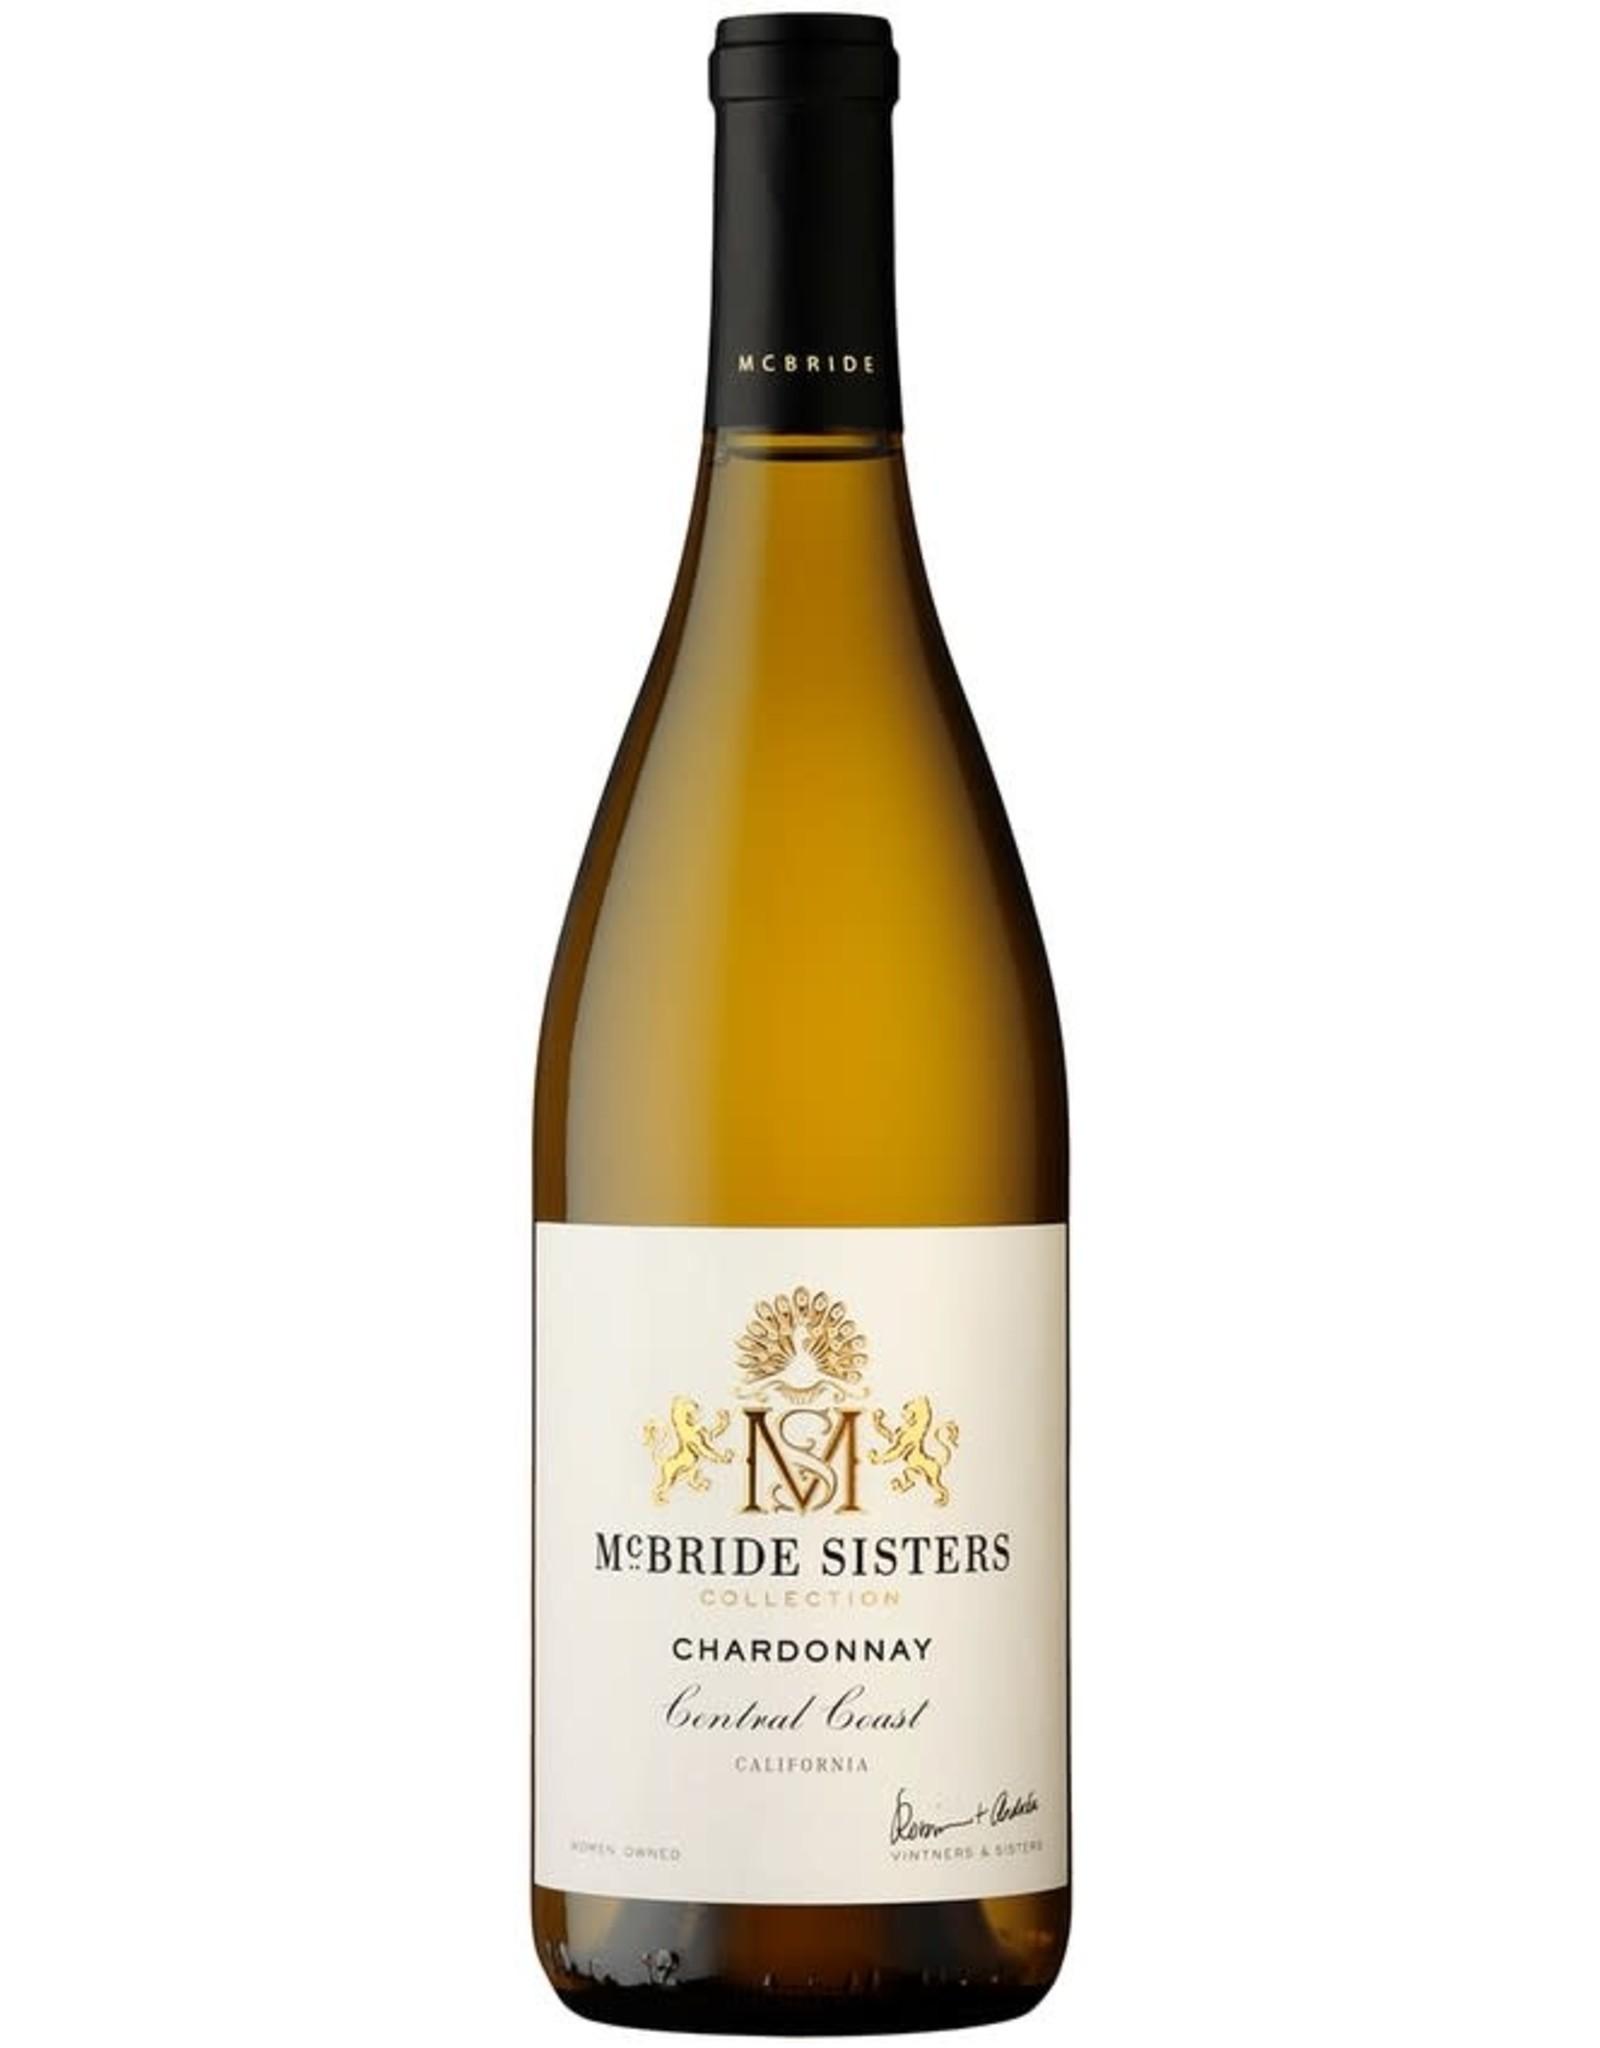 McBride Sisters Chardonnay 2018